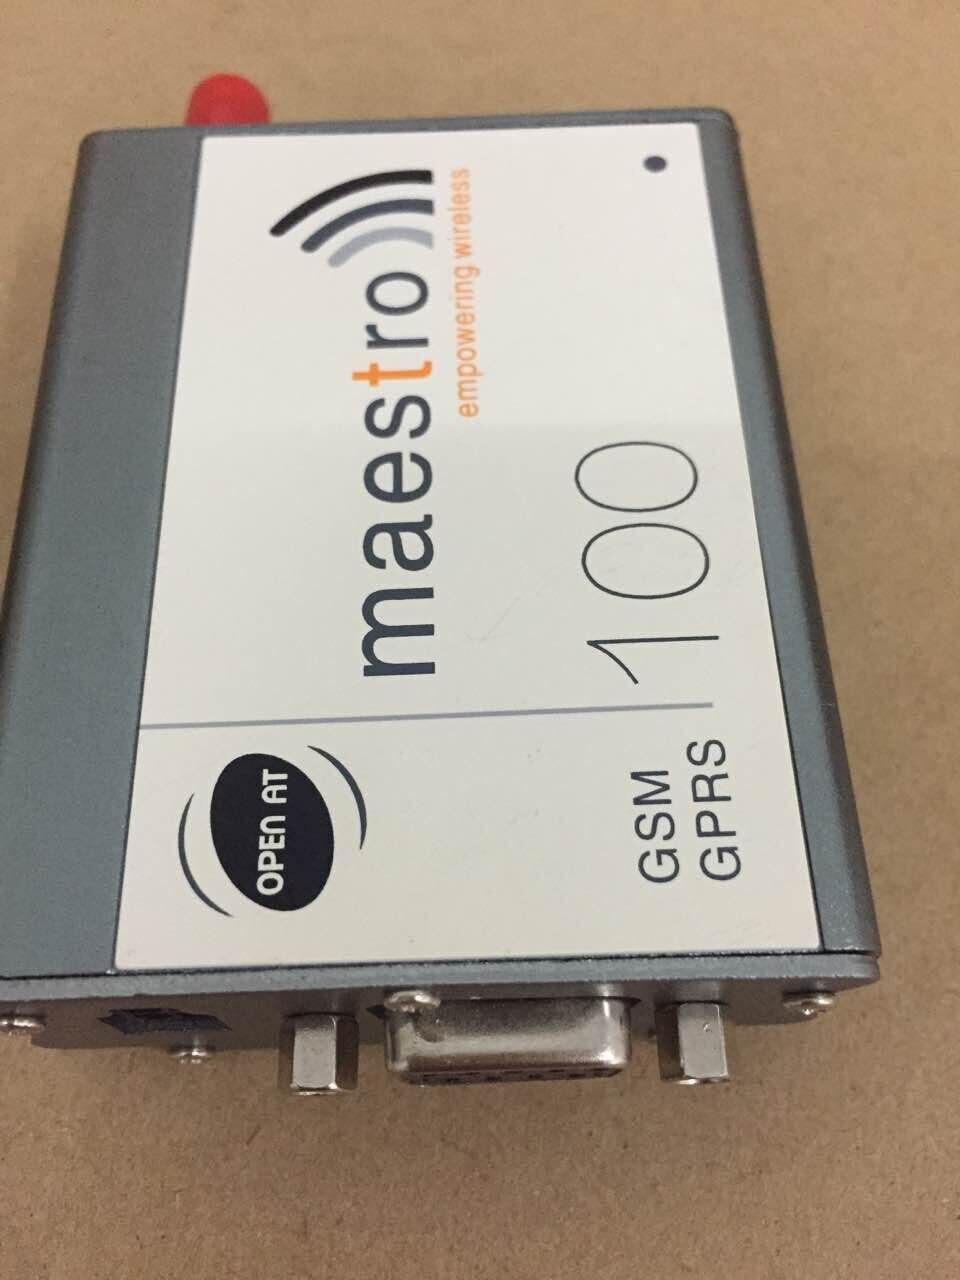 Single port low cost rs232/usb wavecom SL6087 quad-band gsm gprs edge modem data transfer devices brand new ts2651n111e78 rotary encoder tamagawa resolver brt smartsyn made in japan